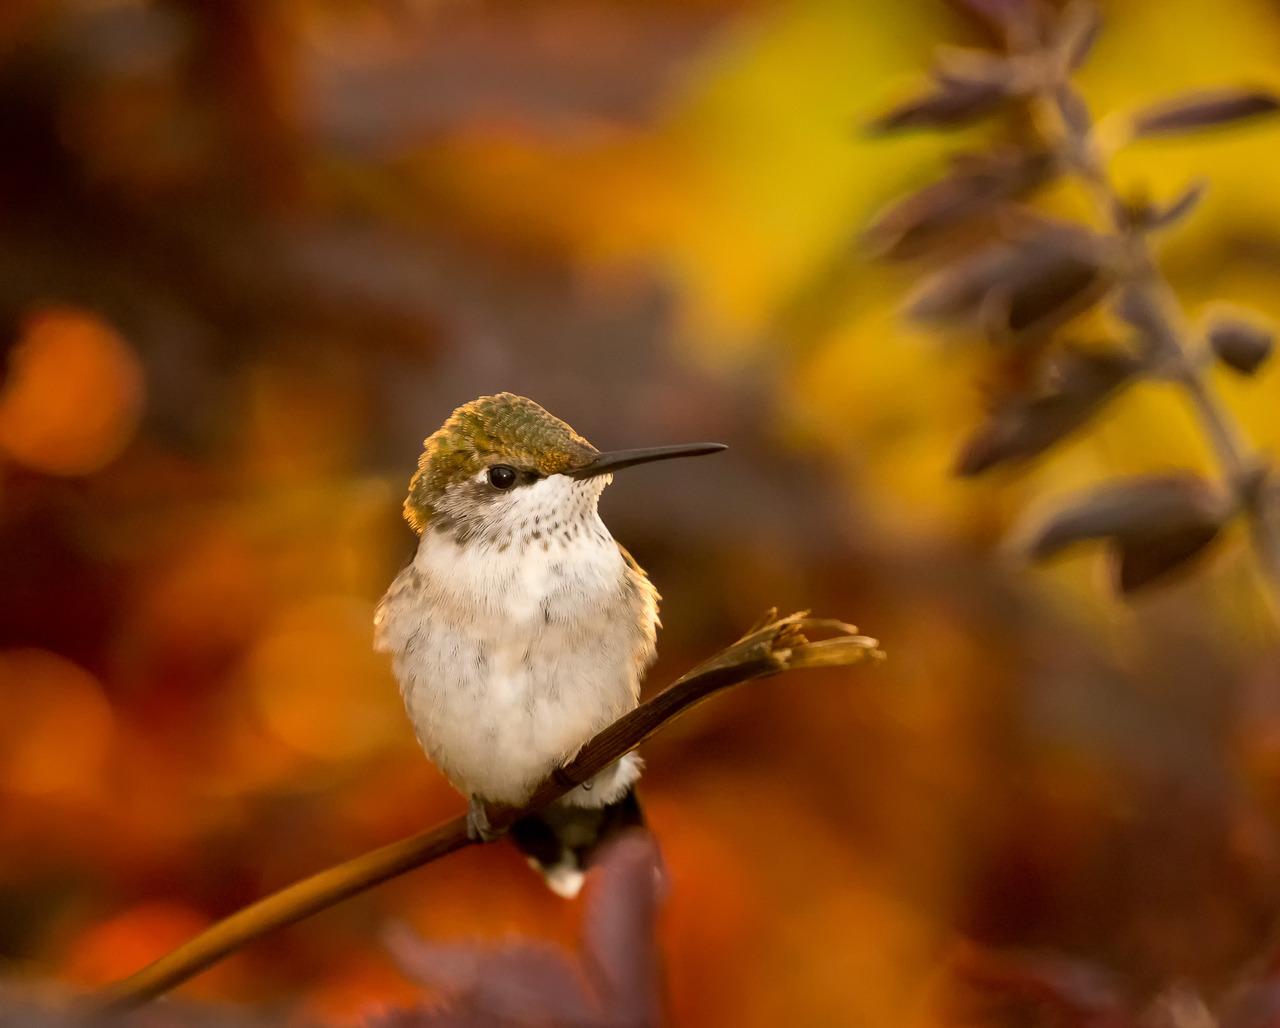 Honorable Mention - Colorful Hummingbird - Joe Fierst - Minnesota Nature Photography Club